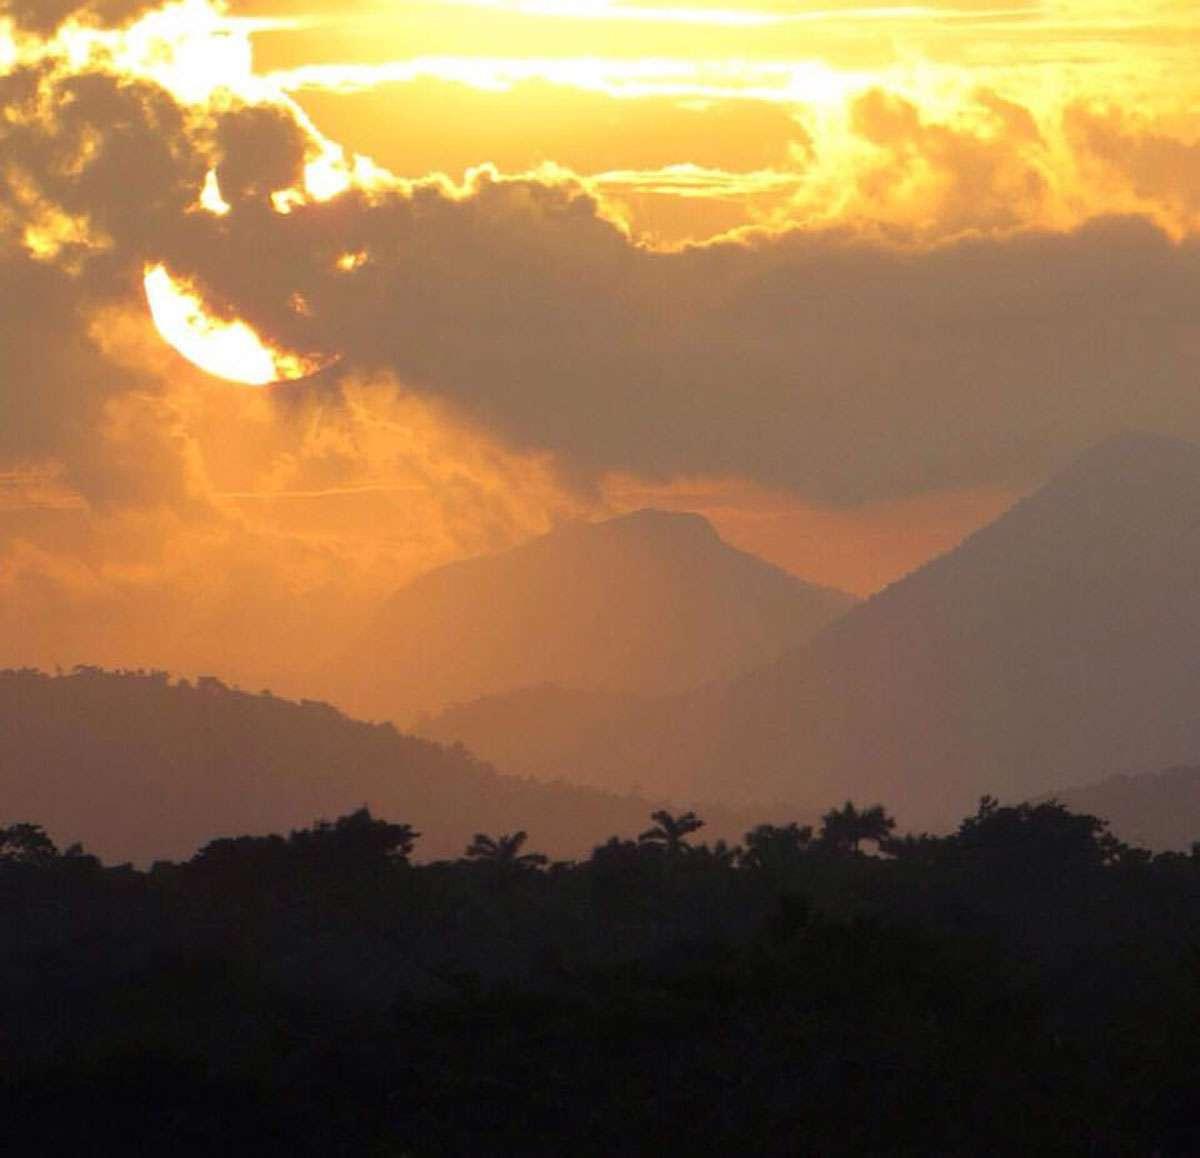 A Belizean sunset. Photo: Chaa Creek Lodge